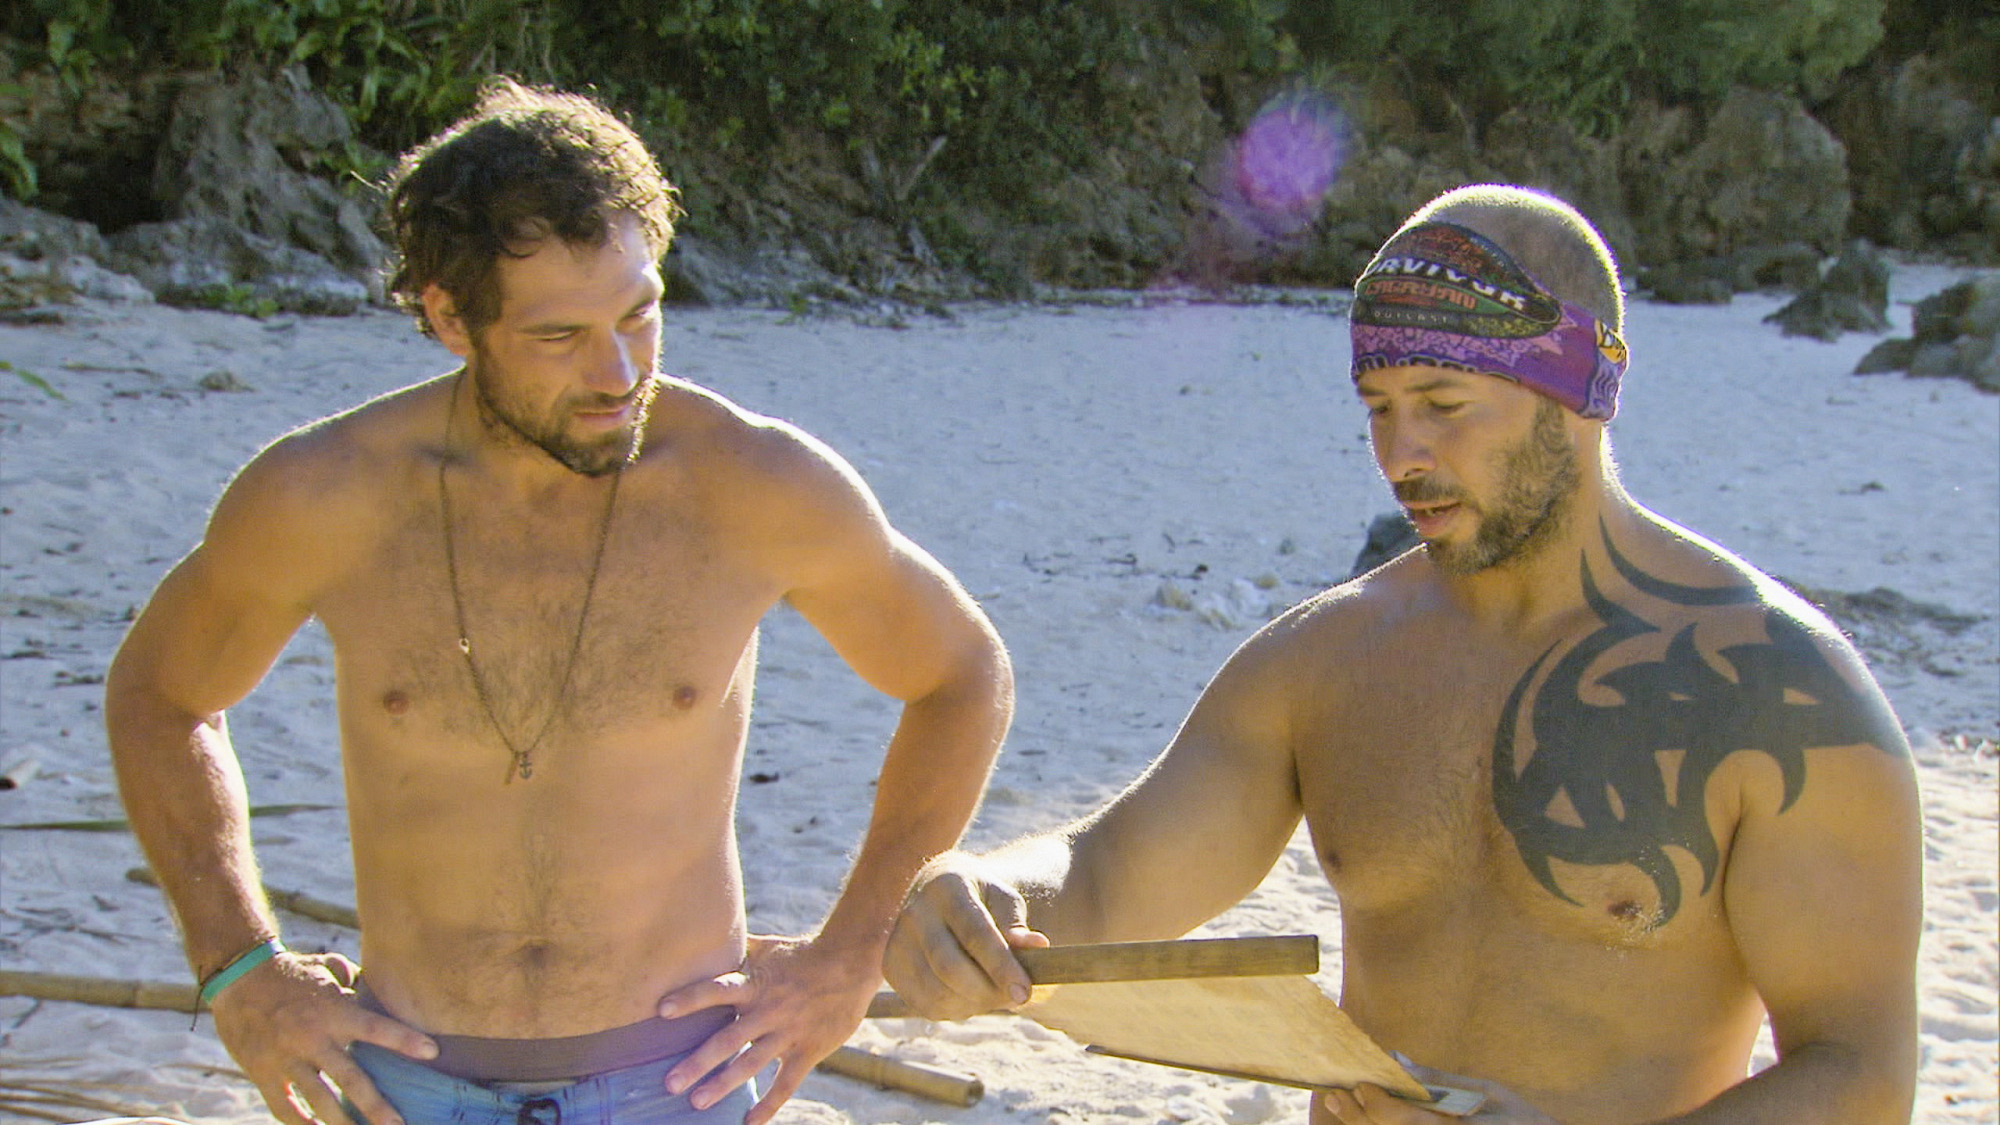 LJ and Tony in Season 28 Episode 6